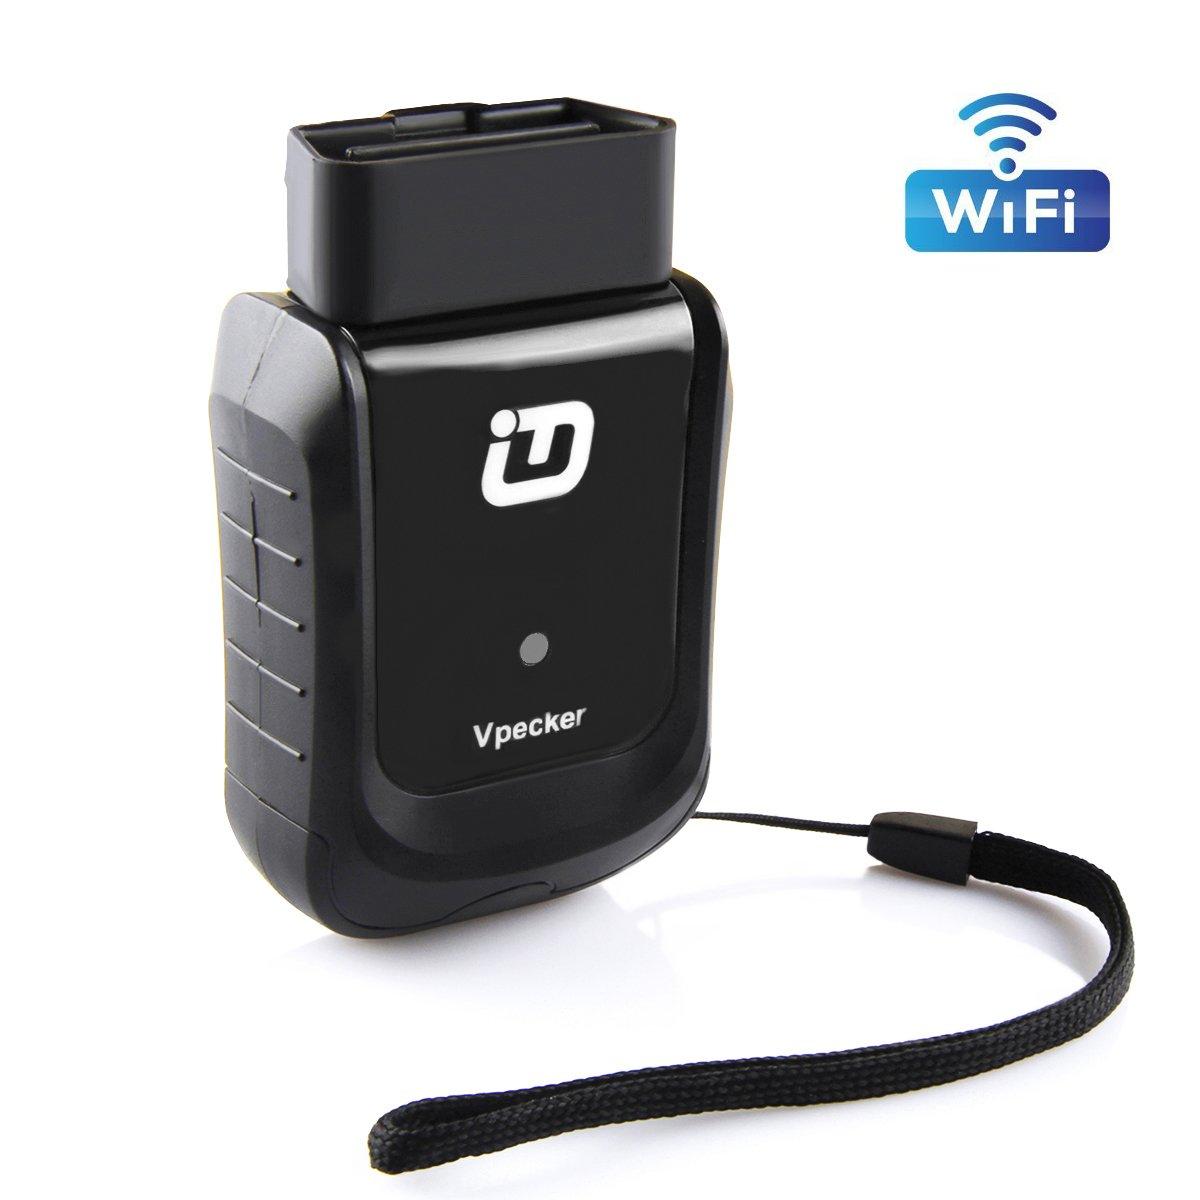 Vpecker WIFI Easydiag V10.3 Car Diagnostic Tool Full System OBDII Scanner OBD2 Automotive Code Reader for American, European, Asian Cars